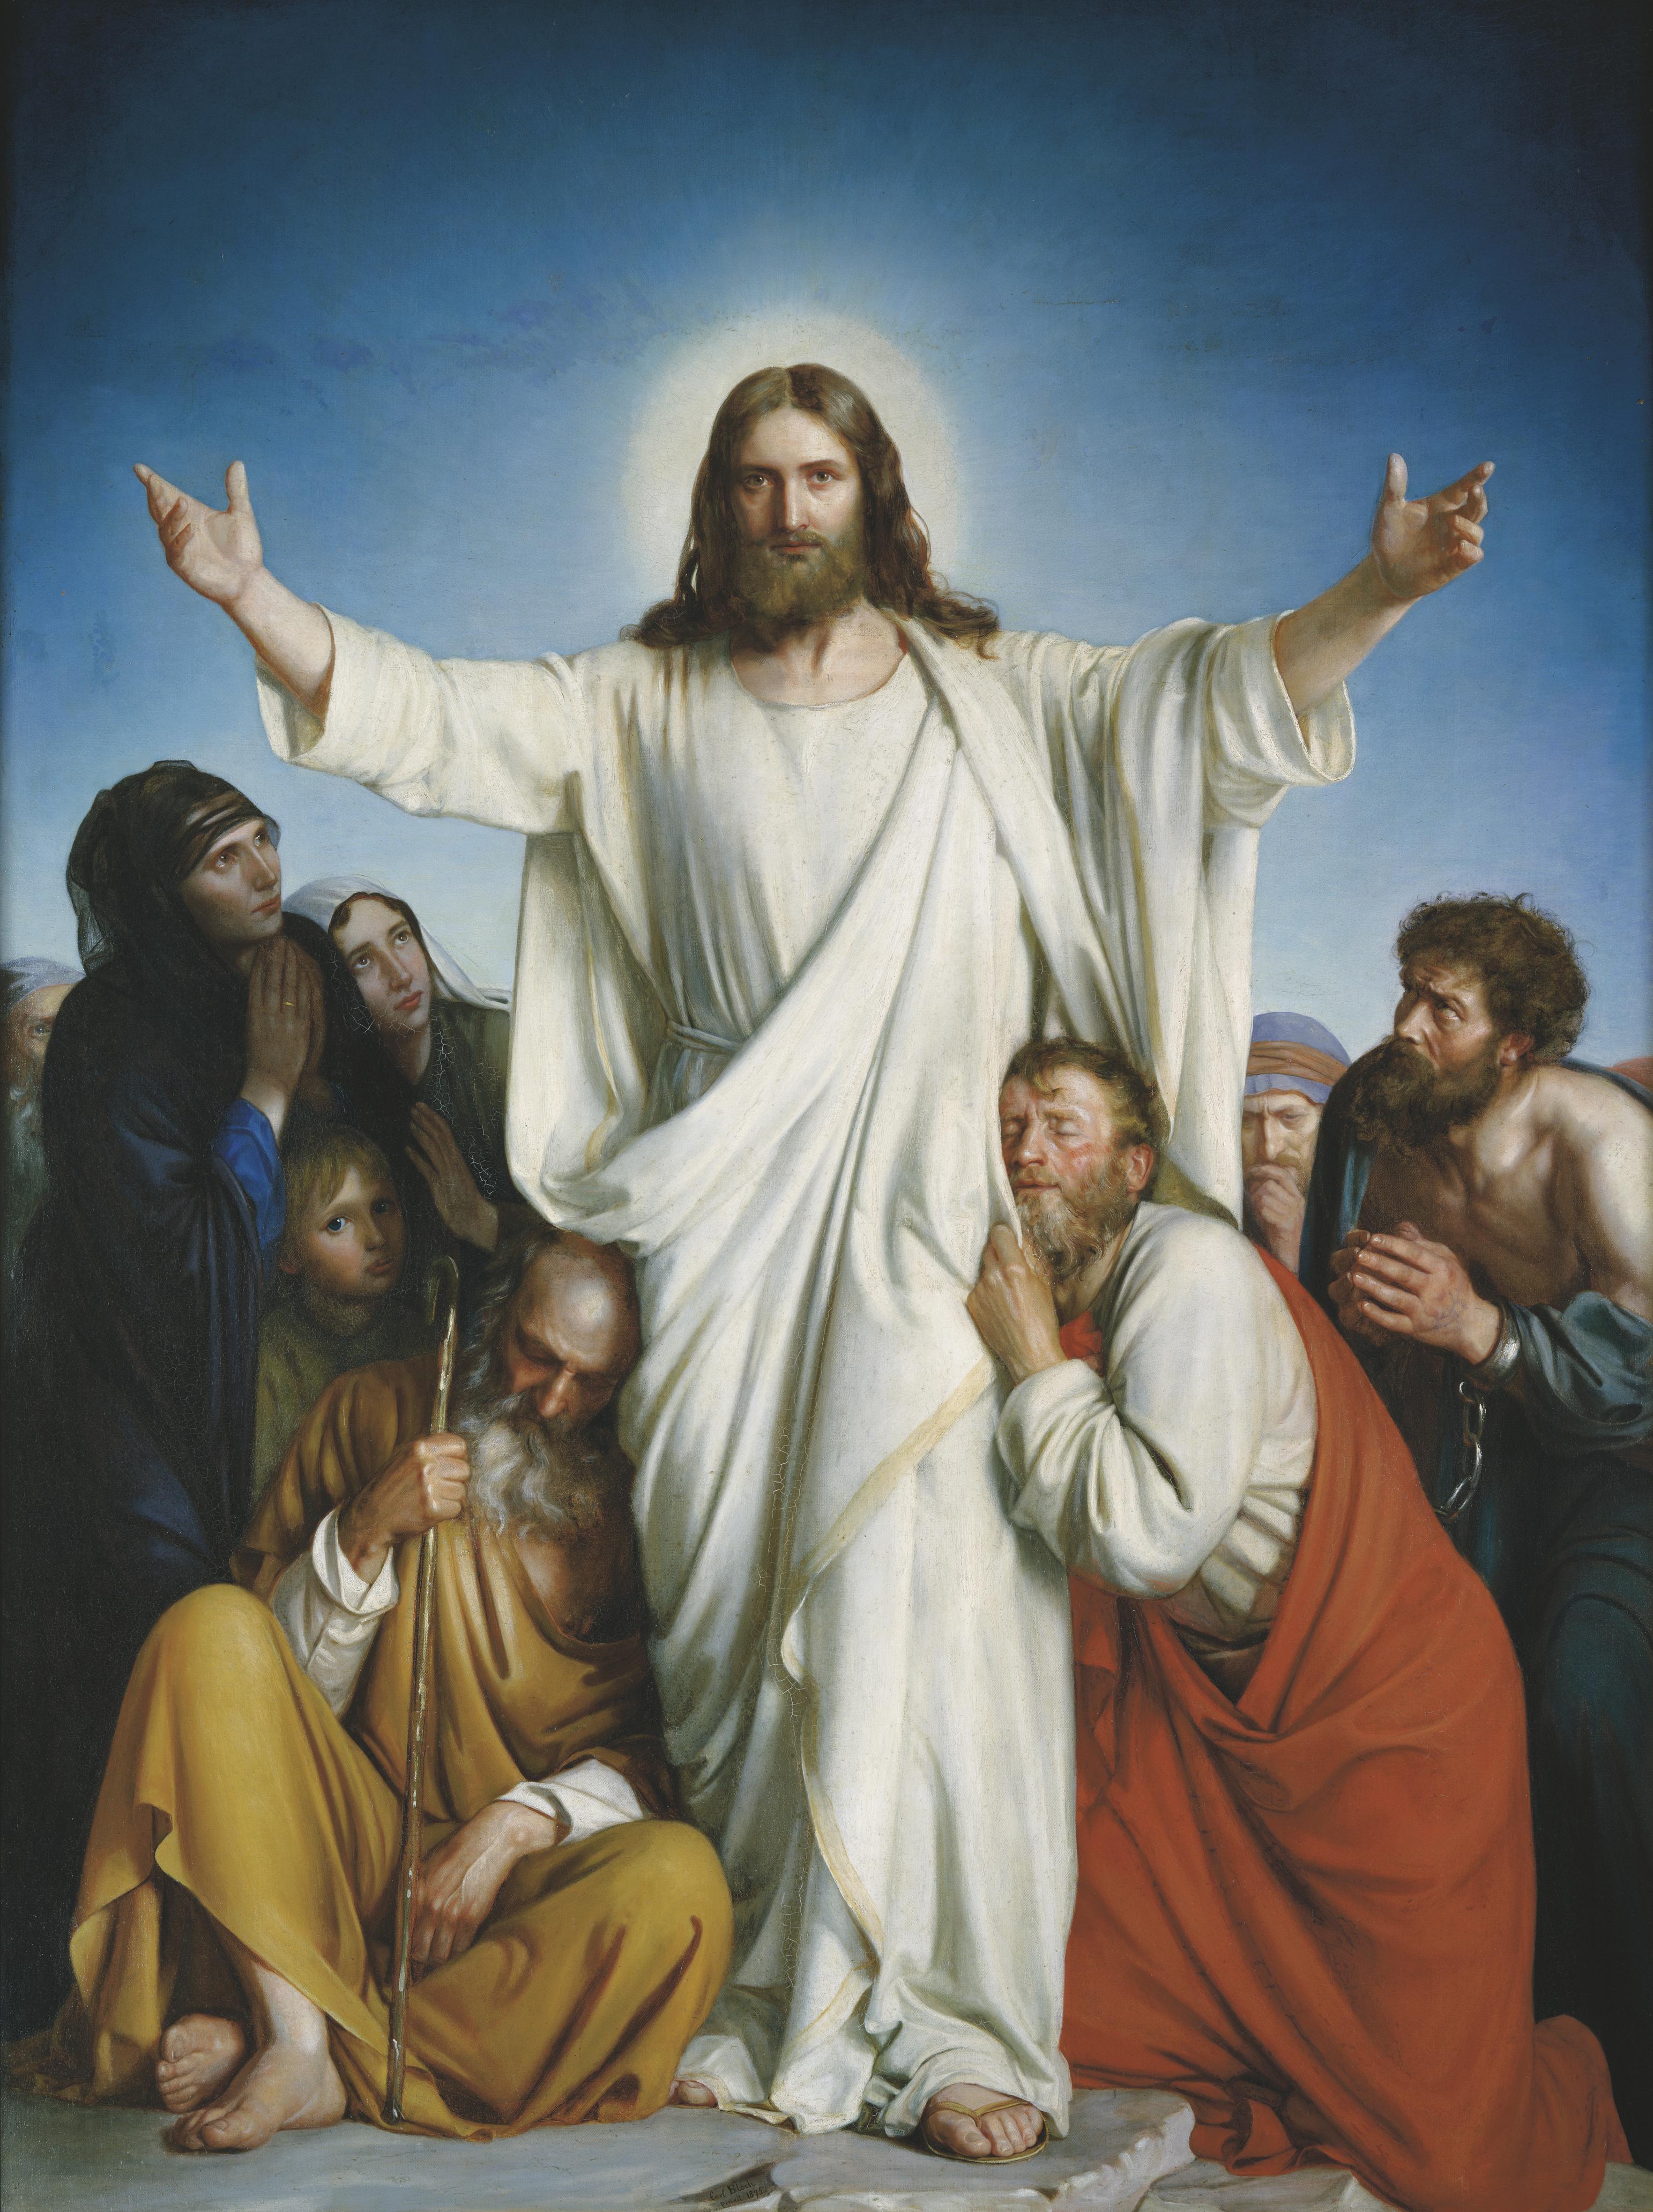 Christus Consolator, by Carl Heinrich Bloch